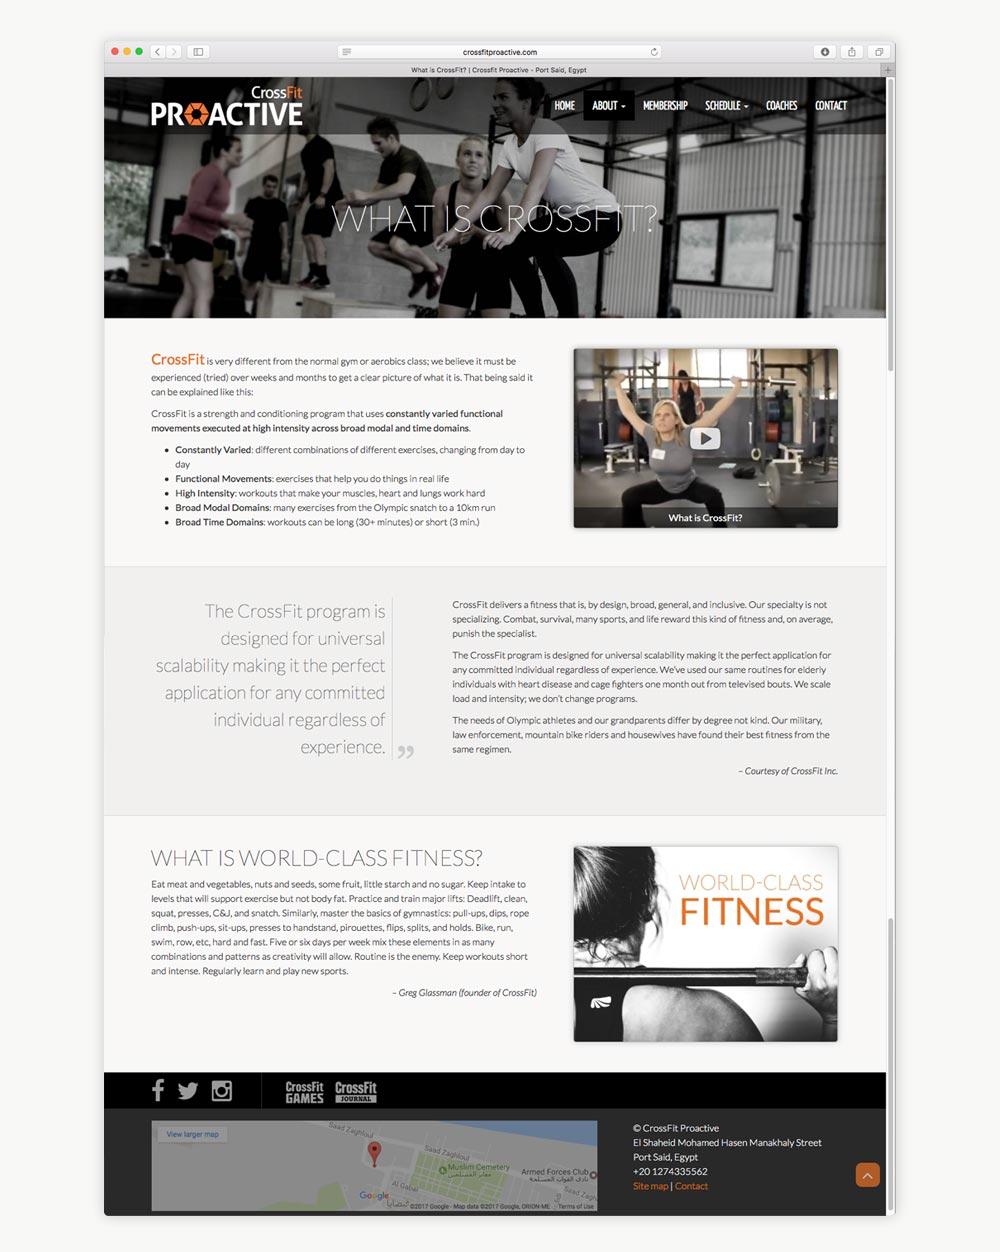 crossfit-proactive-web2